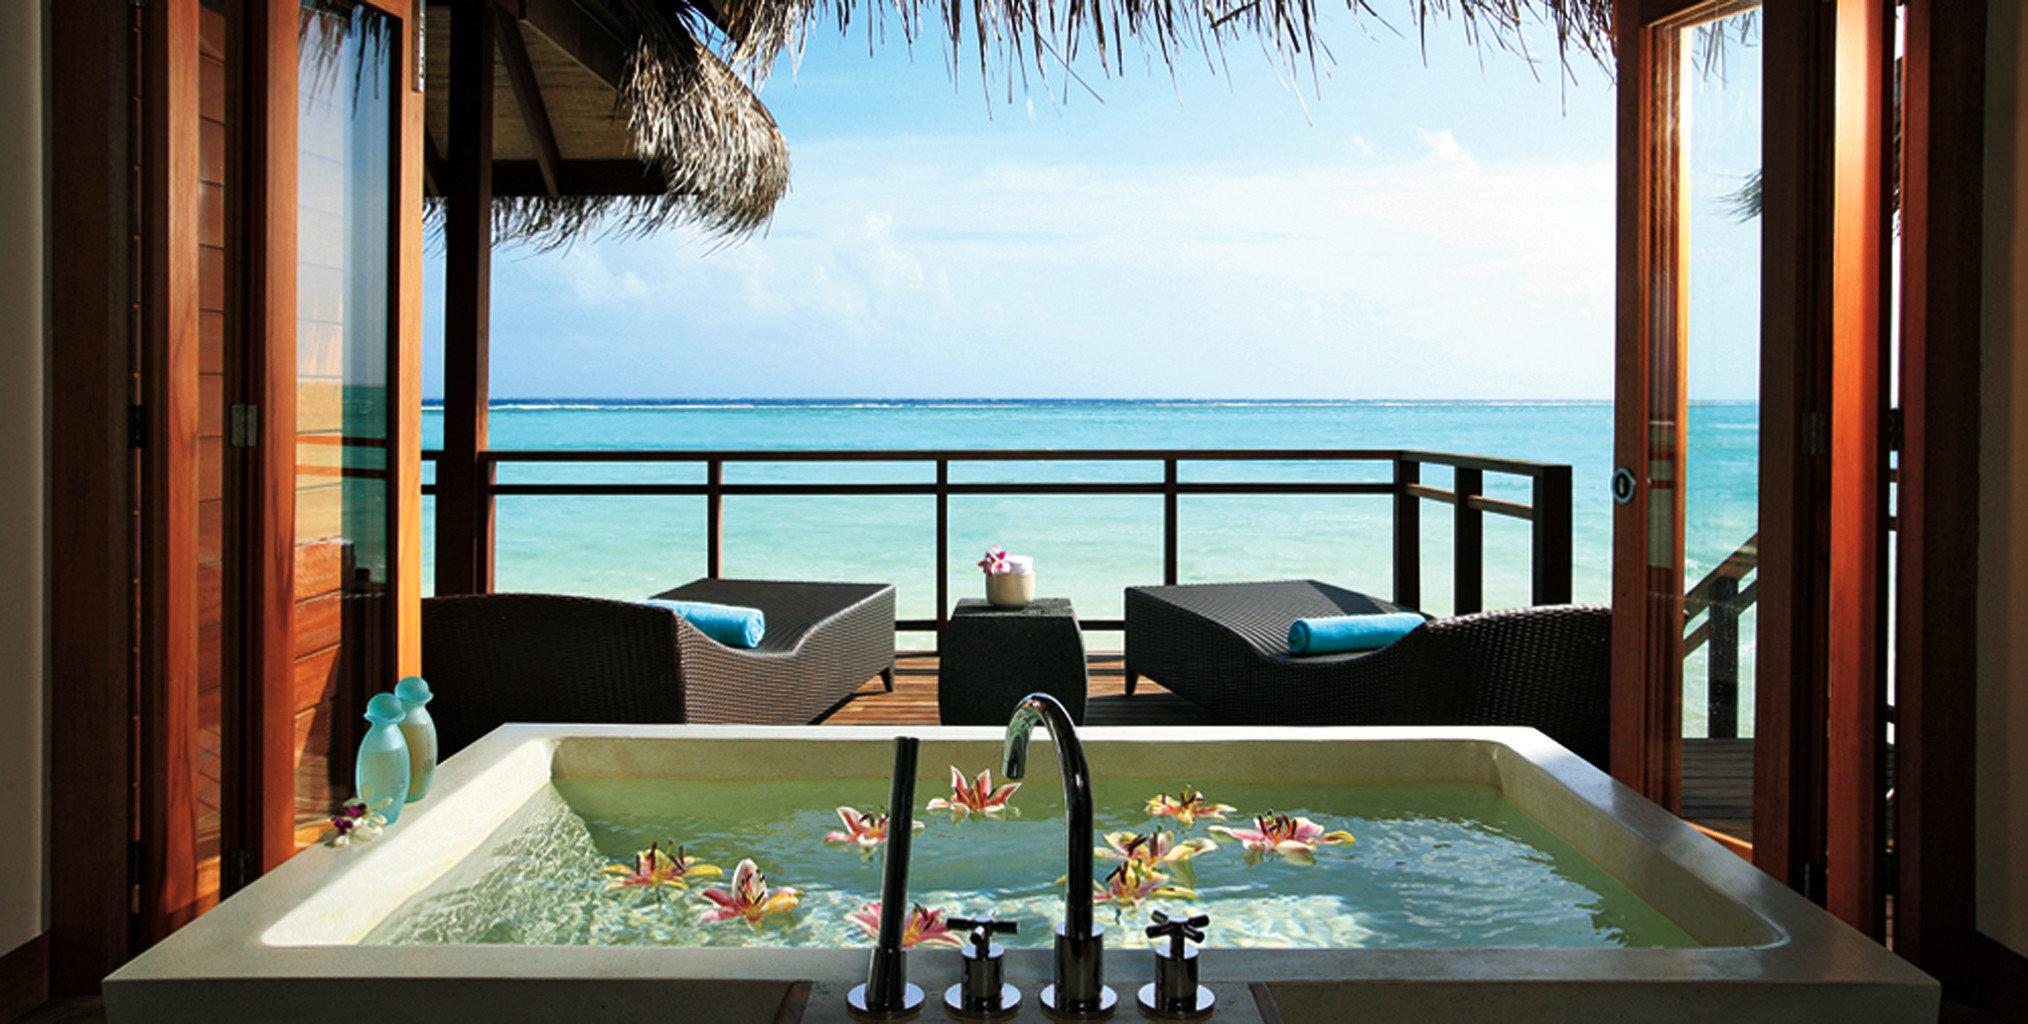 Bath Beachfront Elegant Hotels Luxury Patio swimming pool leisure Resort Villa Suite mansion